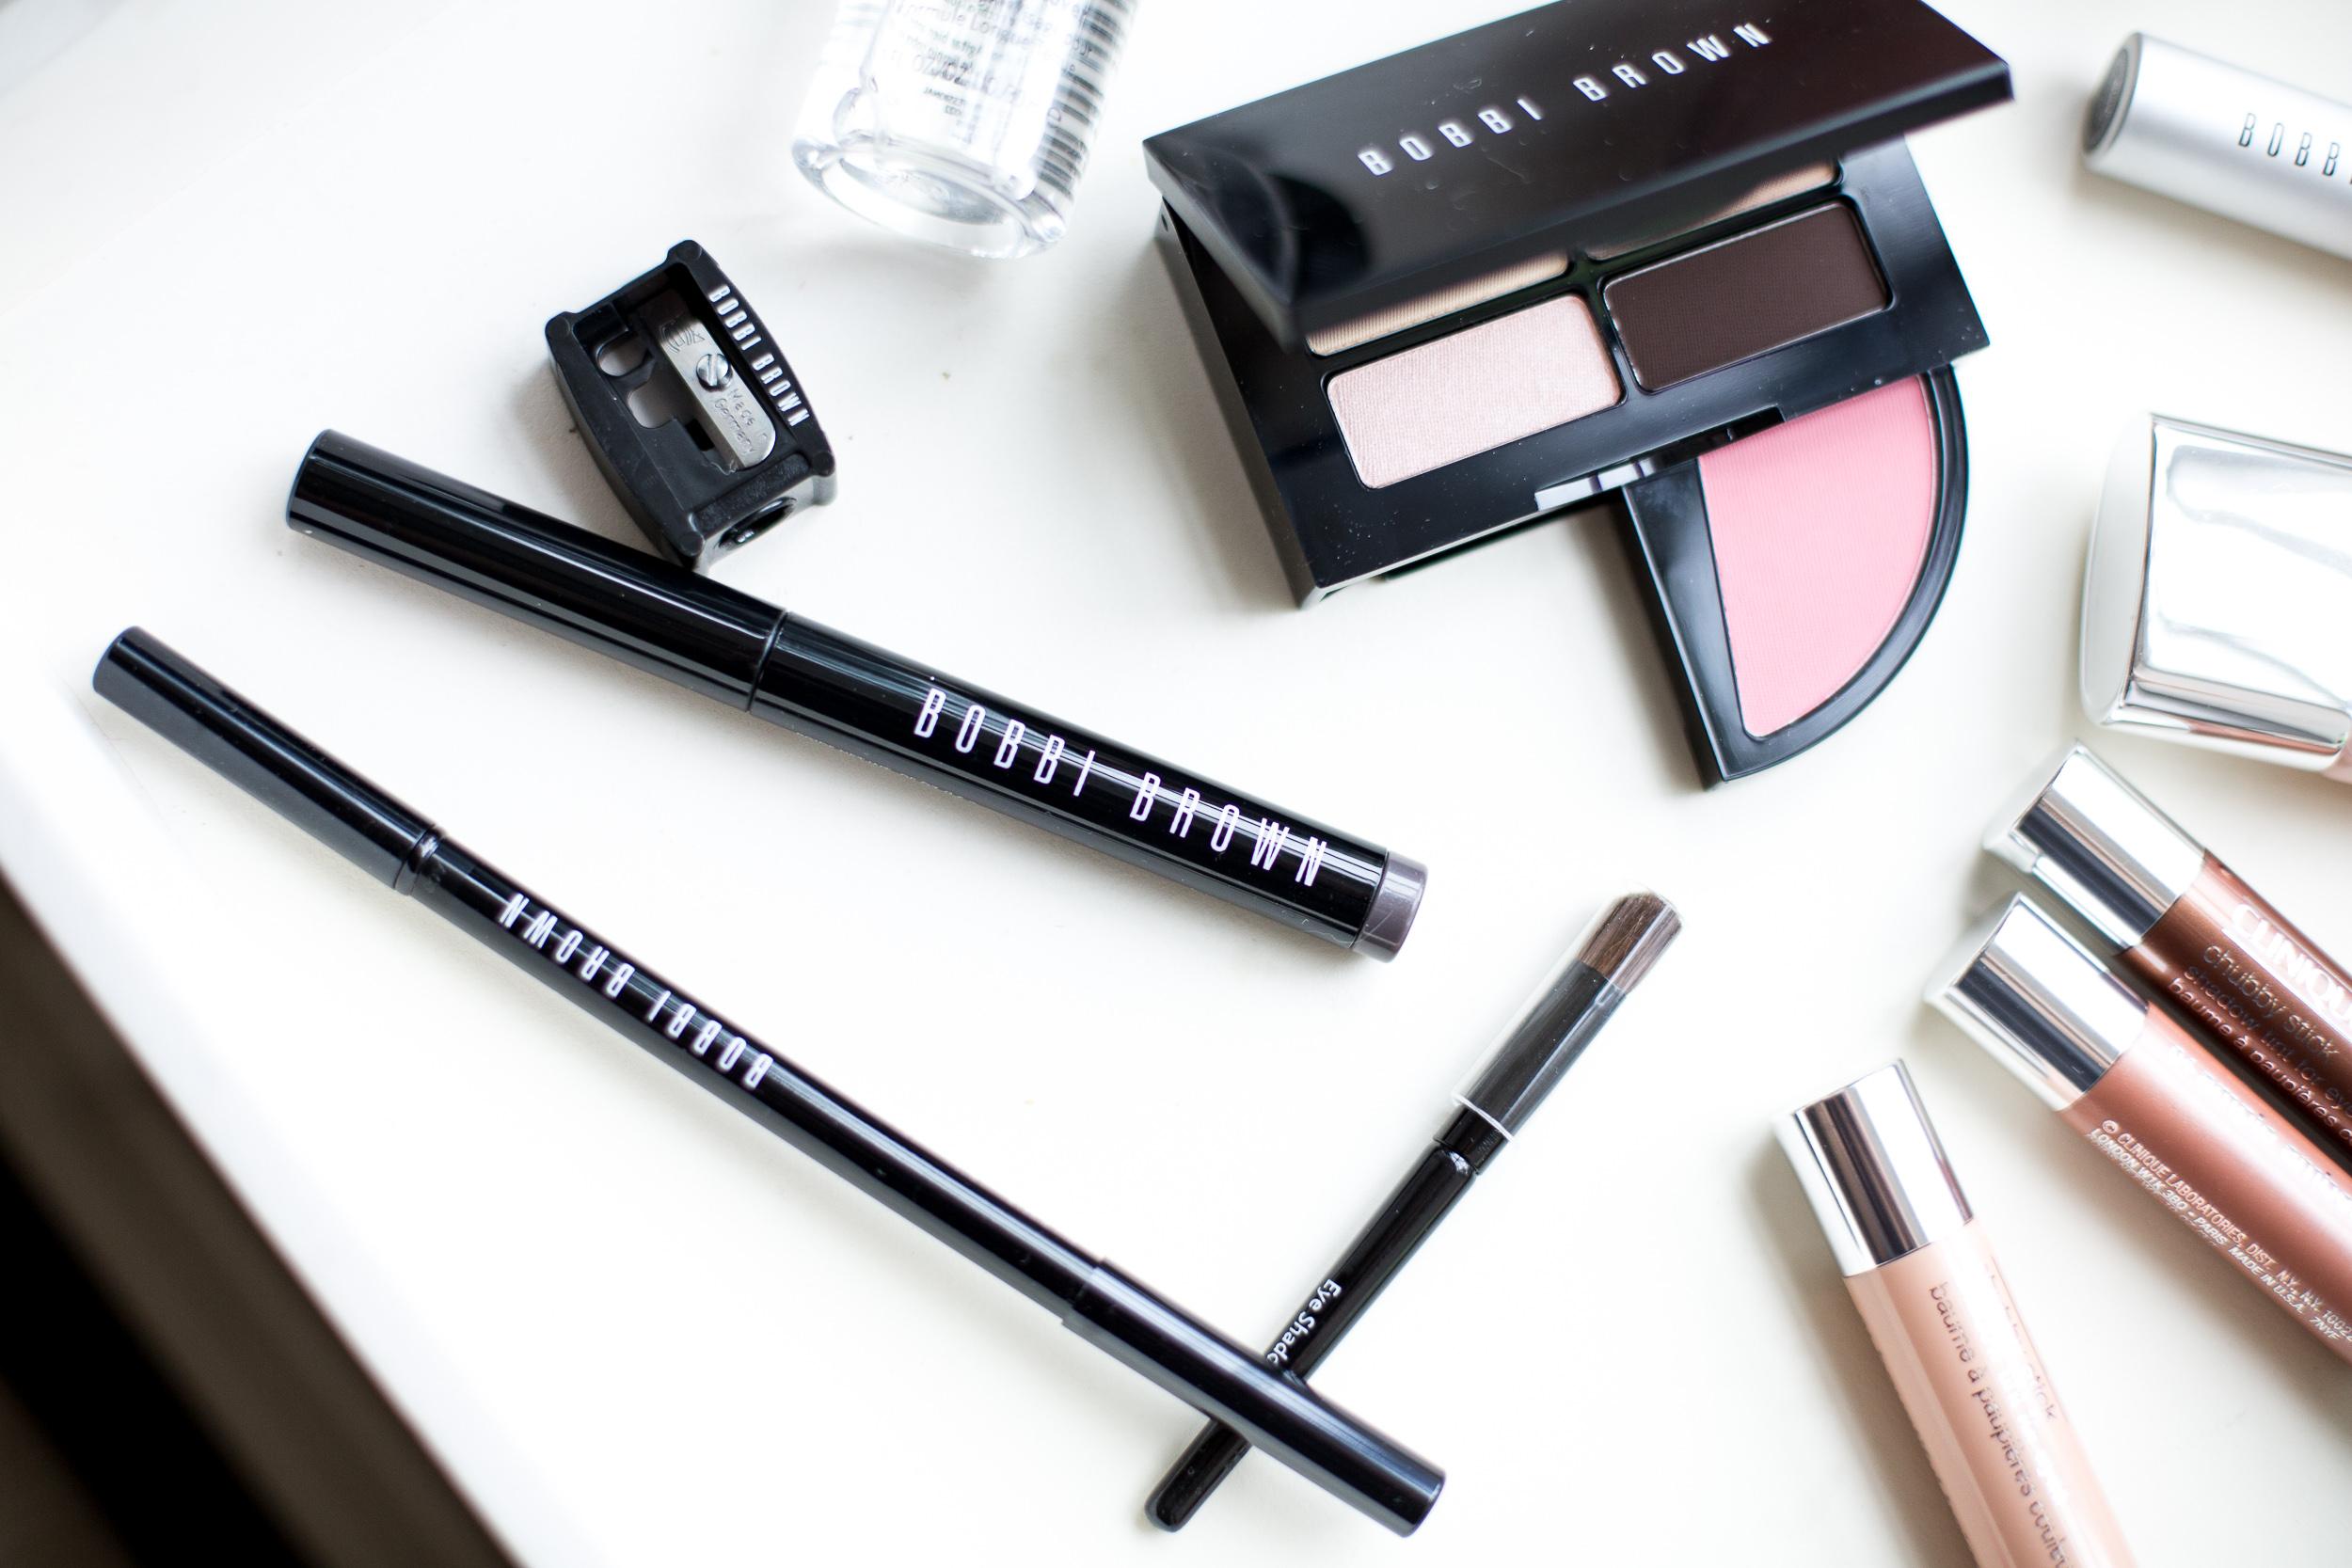 Estee Lauder Travel Makeup